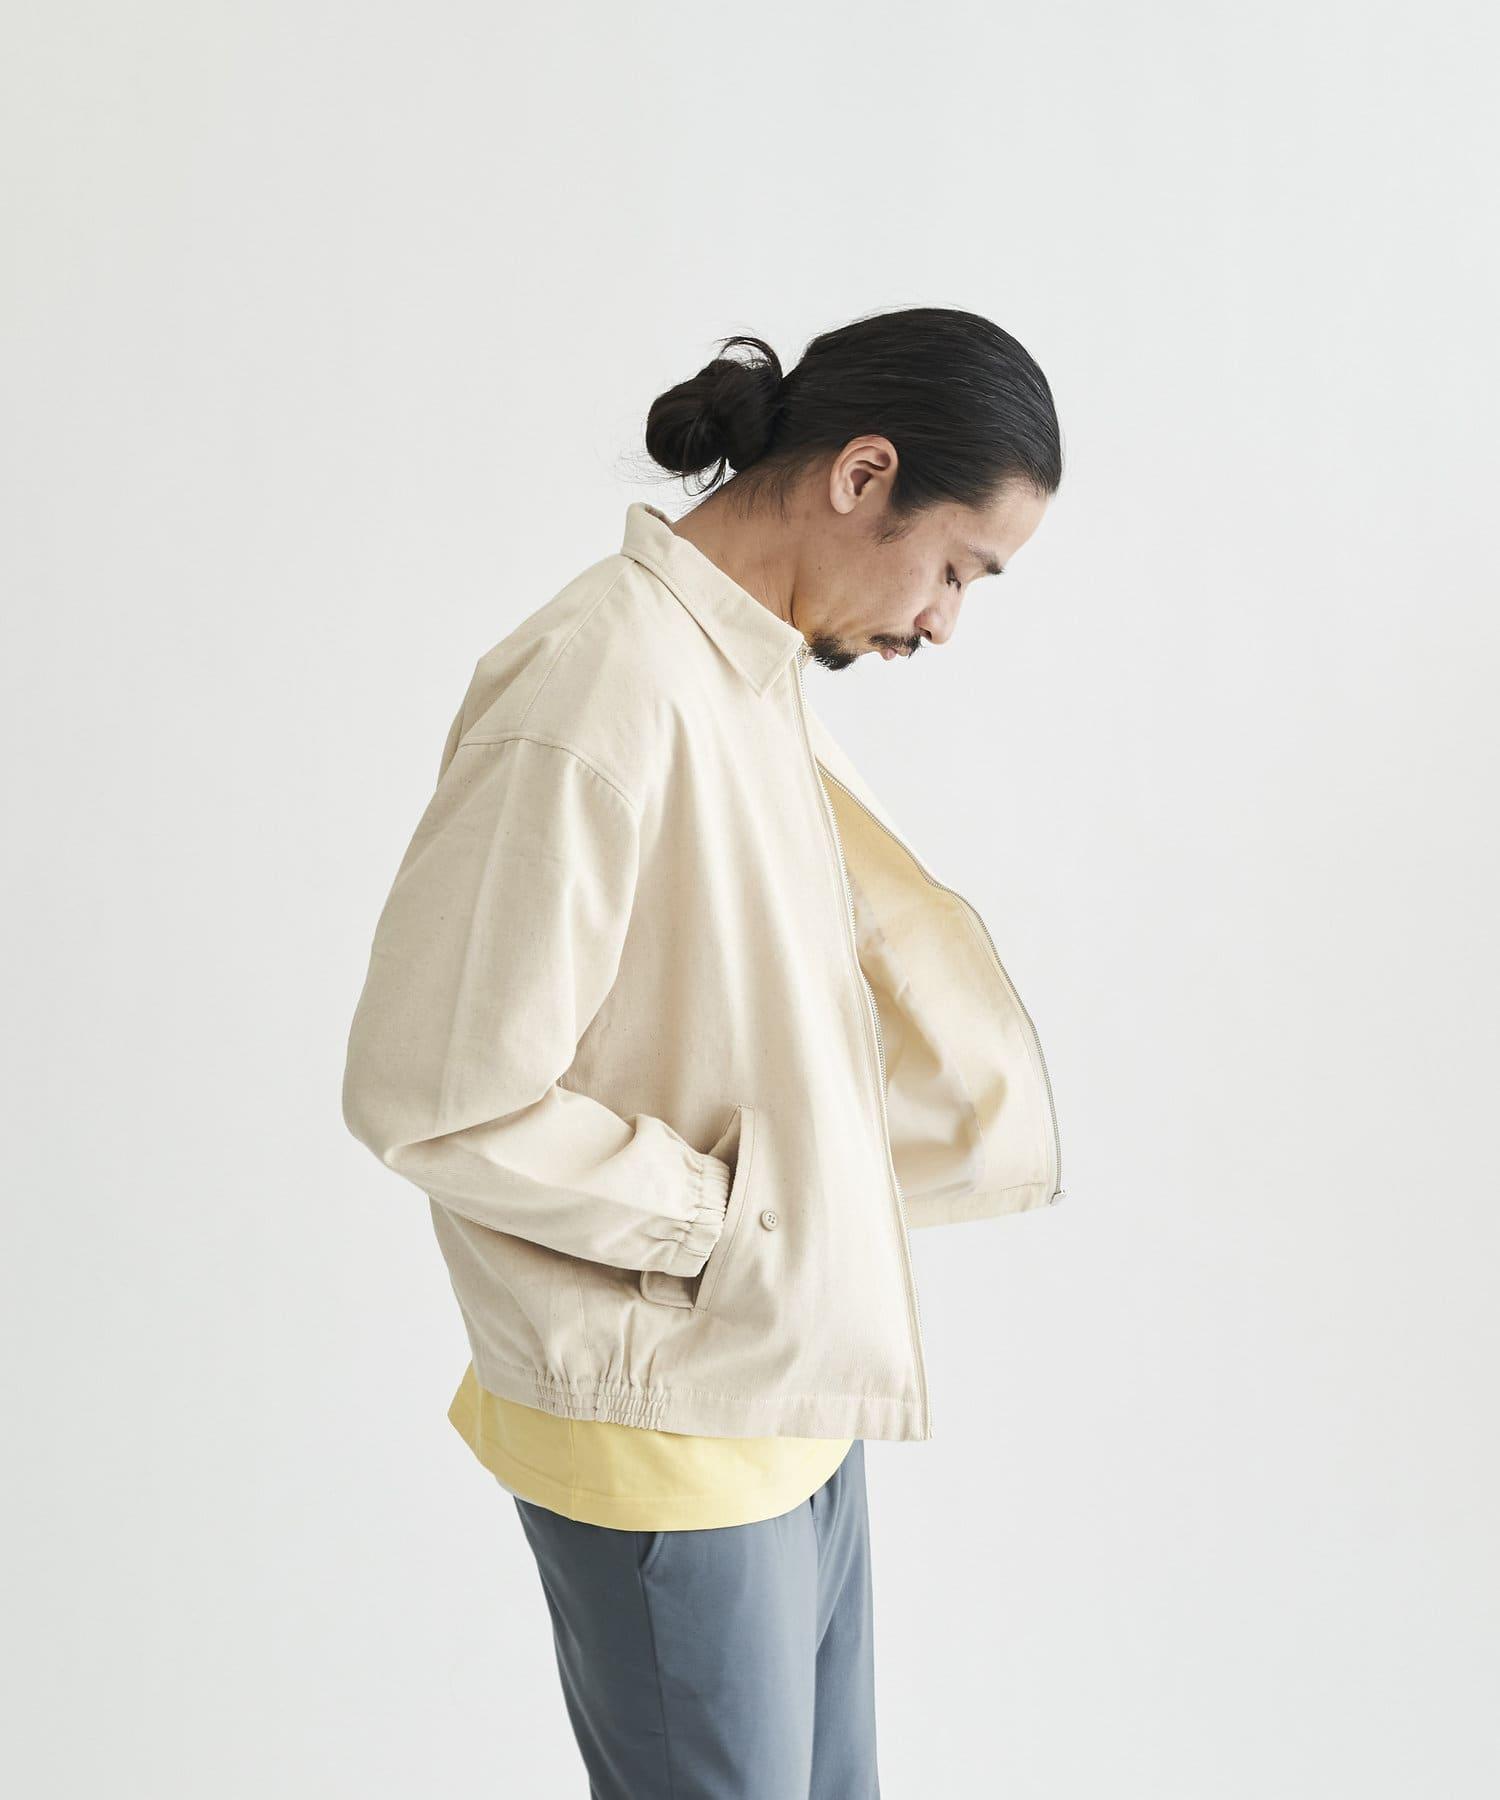 CPCM(シーピーシーエム) 【KANGOL/カンゴール】ルーズドリズラージャケット